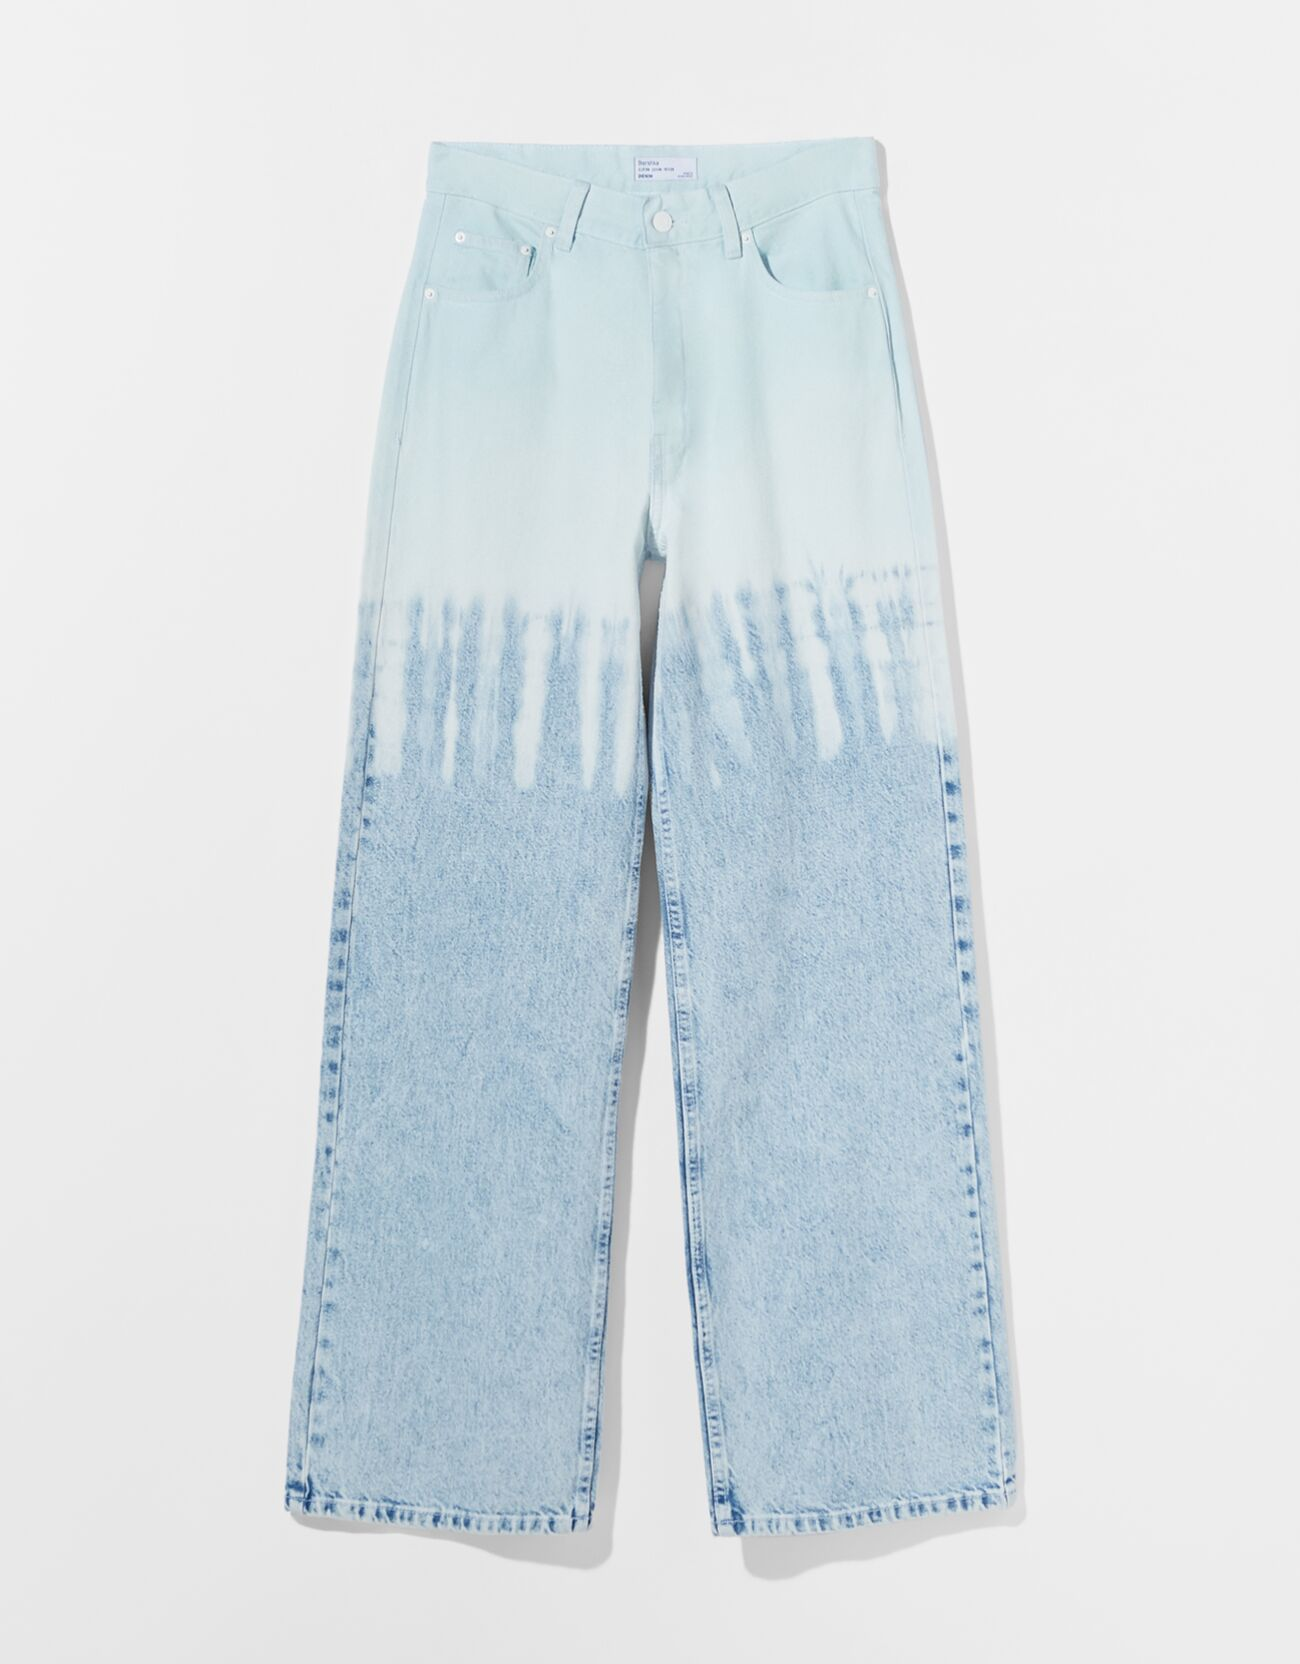 Jeans 90´s efecto tie-dye.